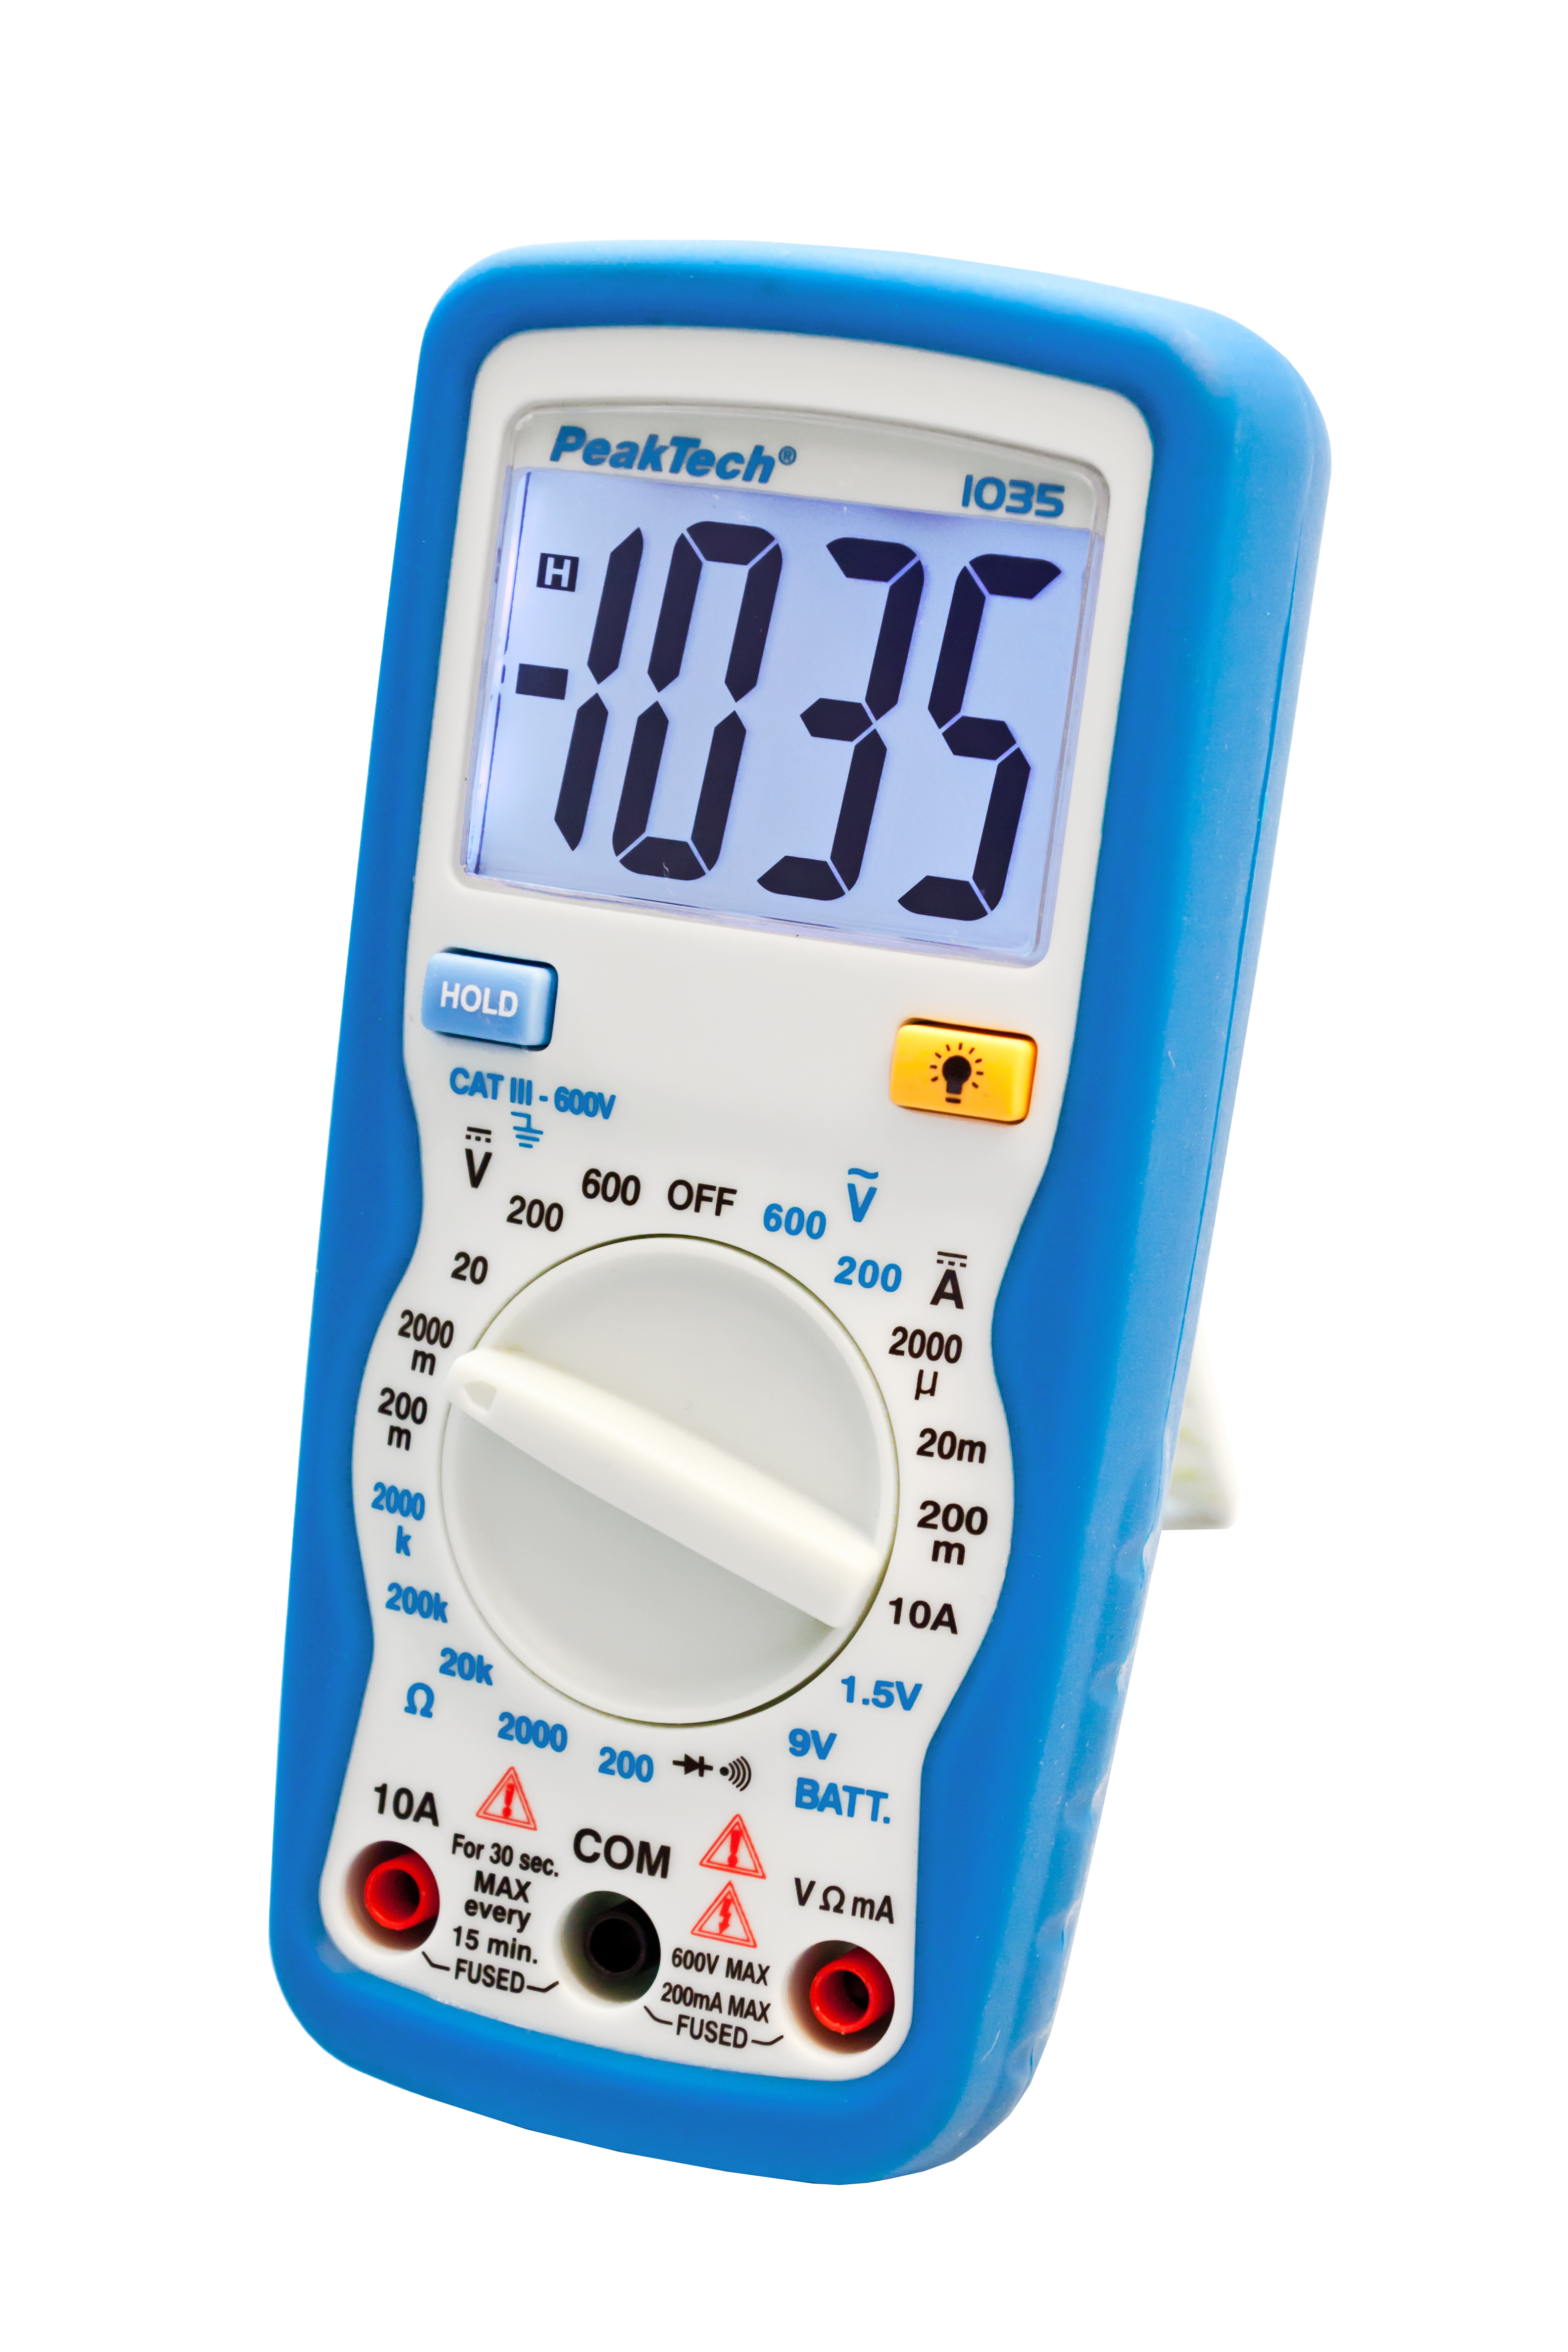 «PeakTech® P 1035» 600V AC / DC digital multimeter ~ 2000 digit LCD